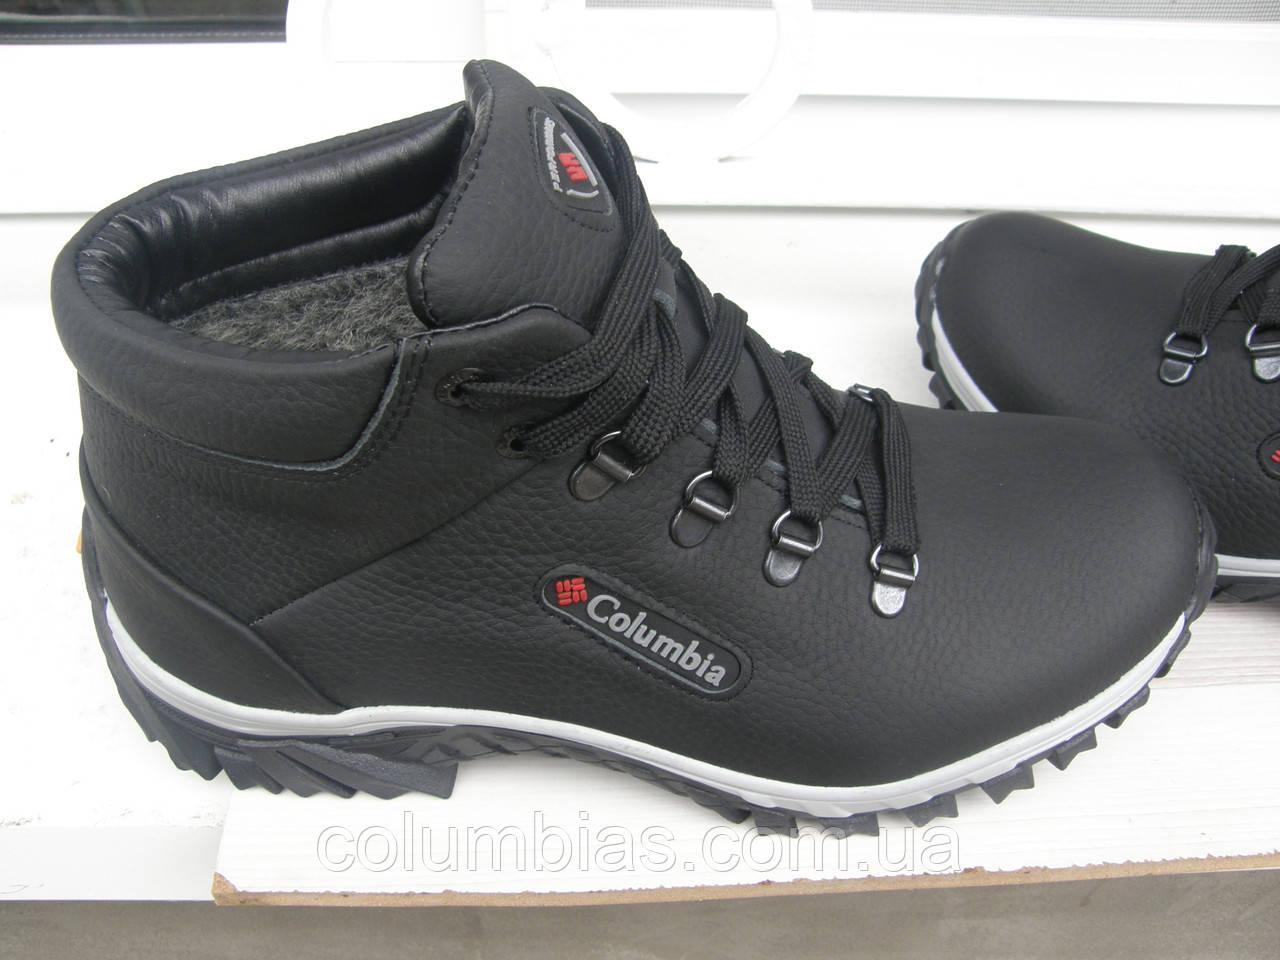 Ботинки зимние Columbiaа н8.